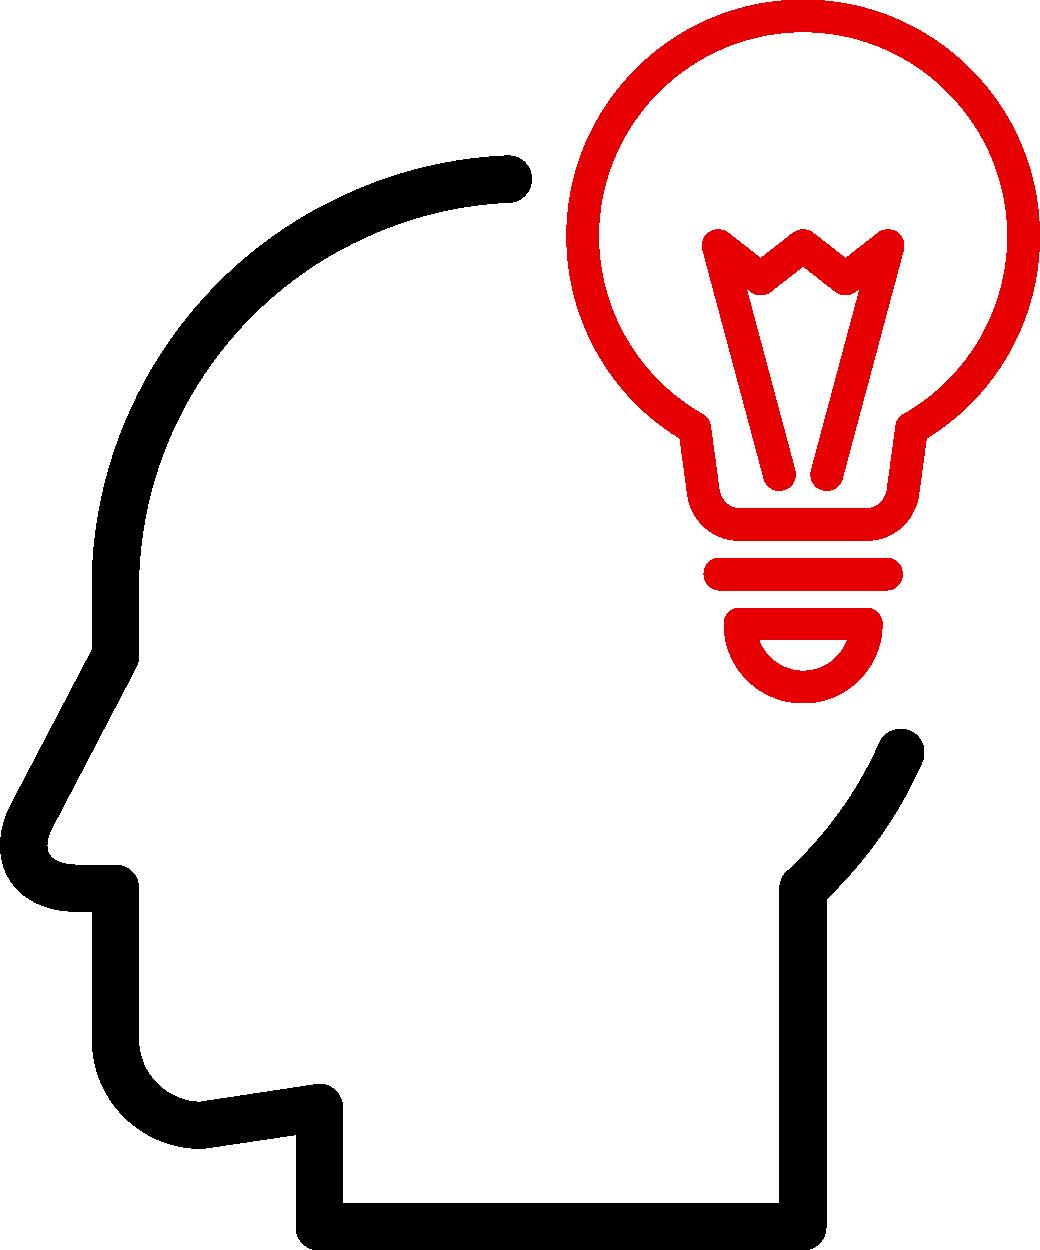 Dictionary clipart pragmatism. Gdpr trifinance awareness sessions